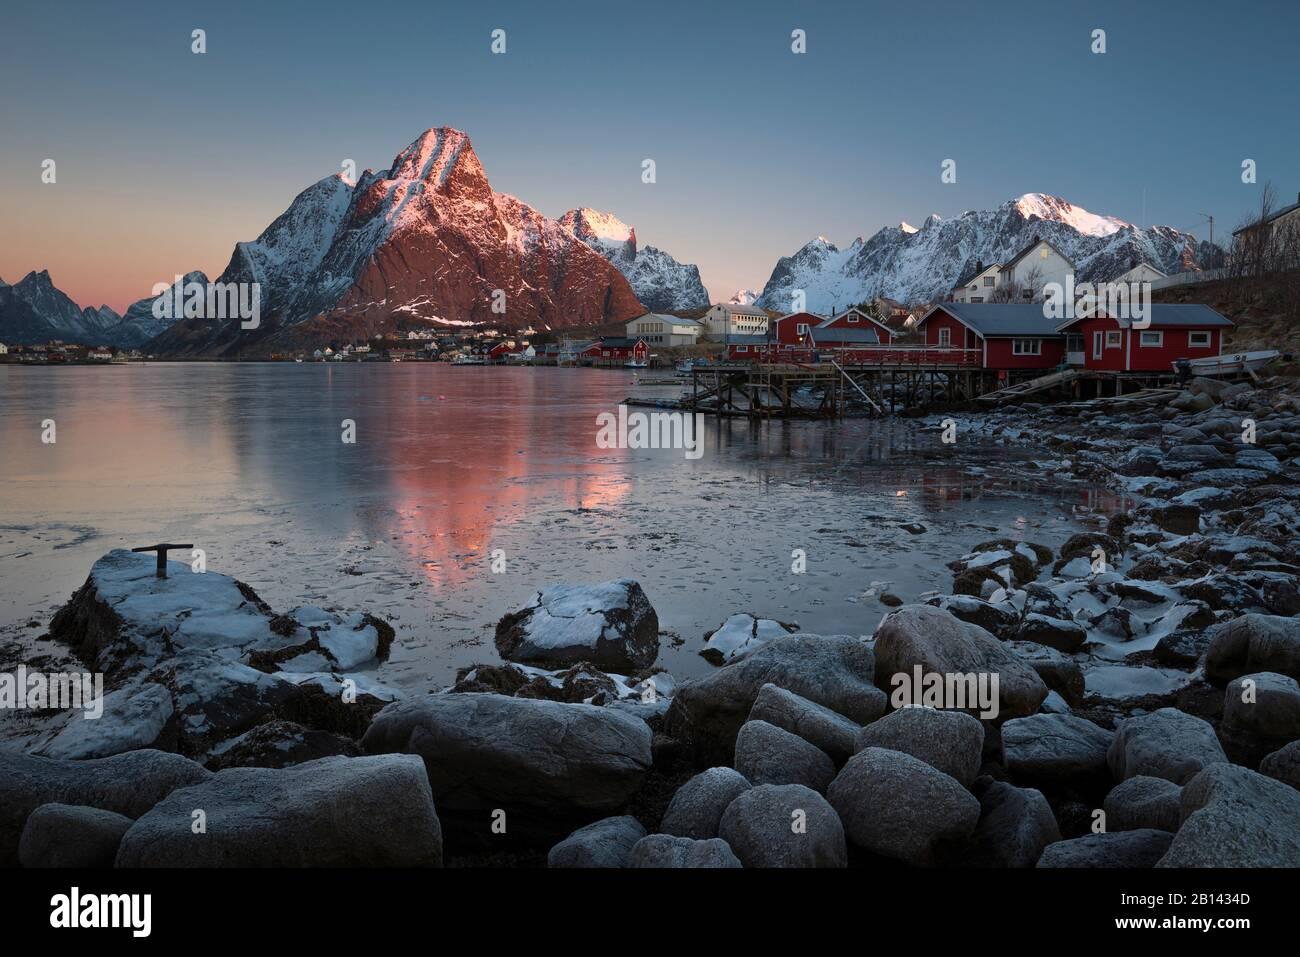 Morning light illuminates the snow-covered Olstinden in the fishing village Reine, Reine, Nordland, Norway Stock Photo